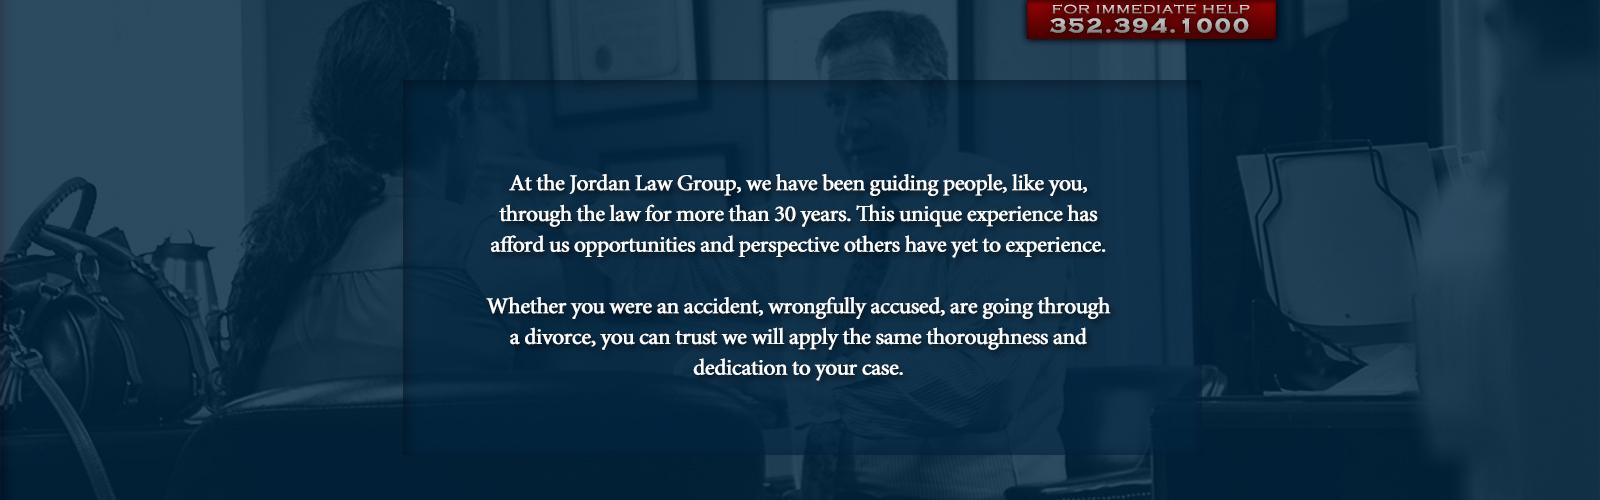 The jordan law group home for Integrity motors tavares fl